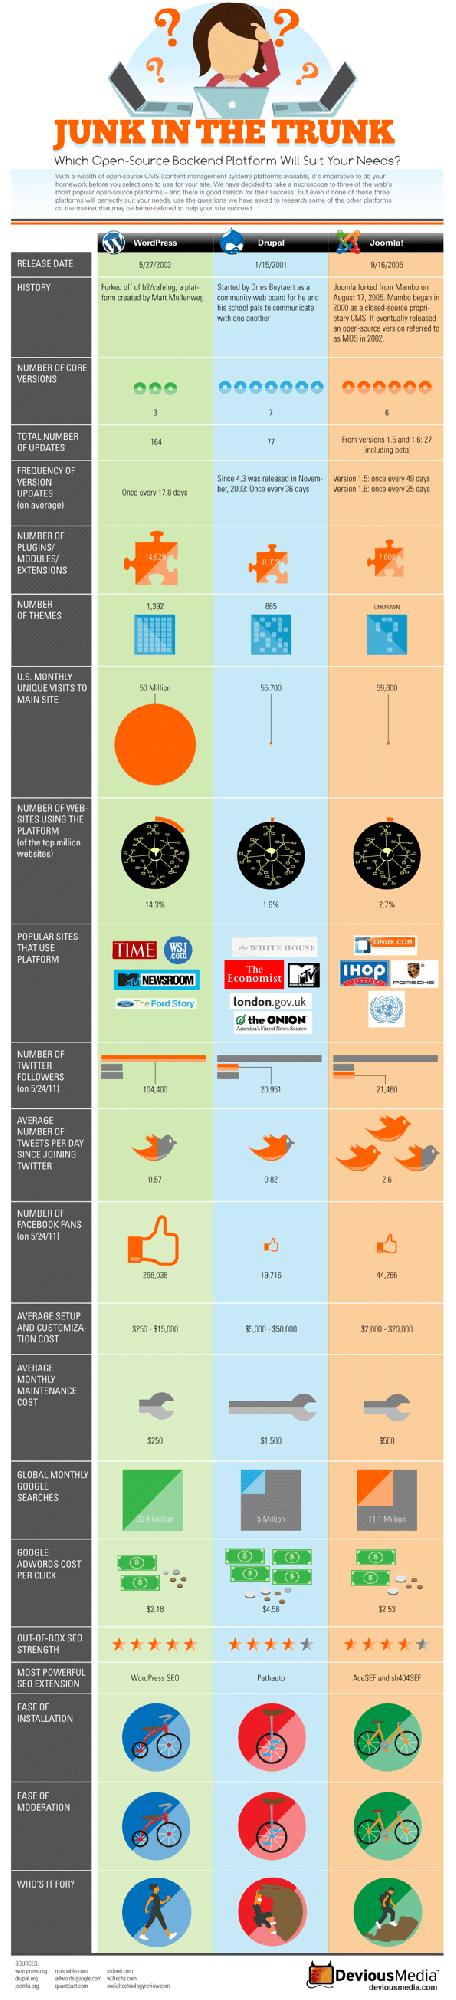 CMS Vergleich - WordPress, Drupal, Joomla